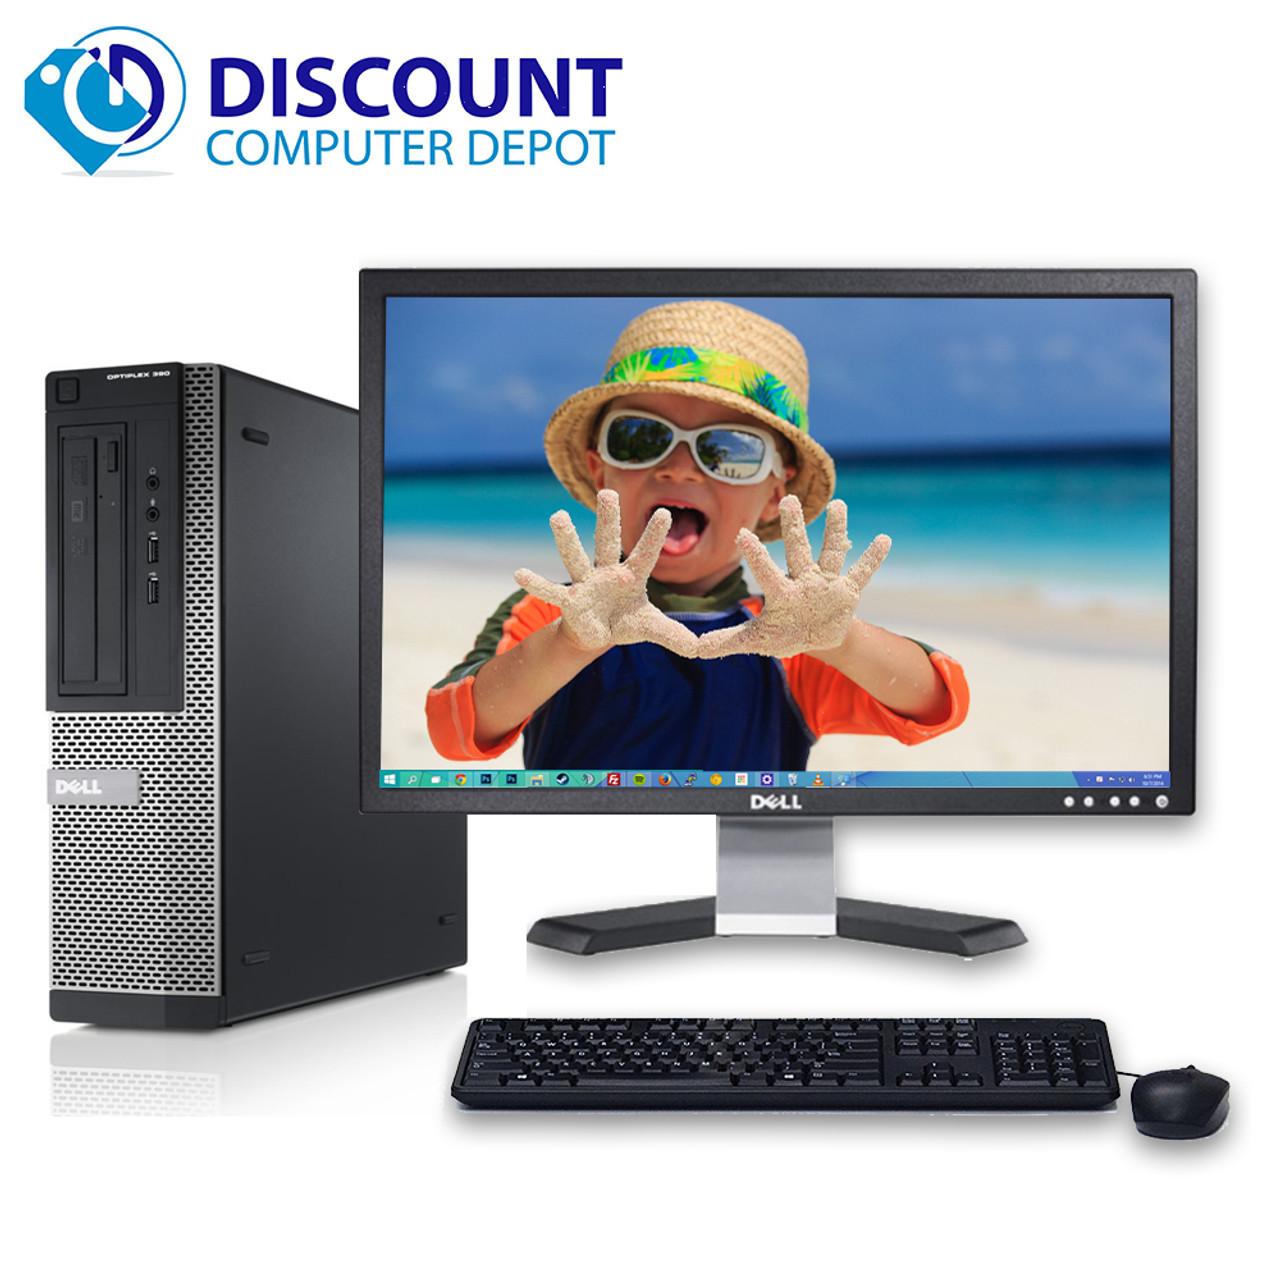 Dell Optiplex 390 Windows 10 Desktop Computer i3 3 1GHz 4GB 250GB HDMI 22